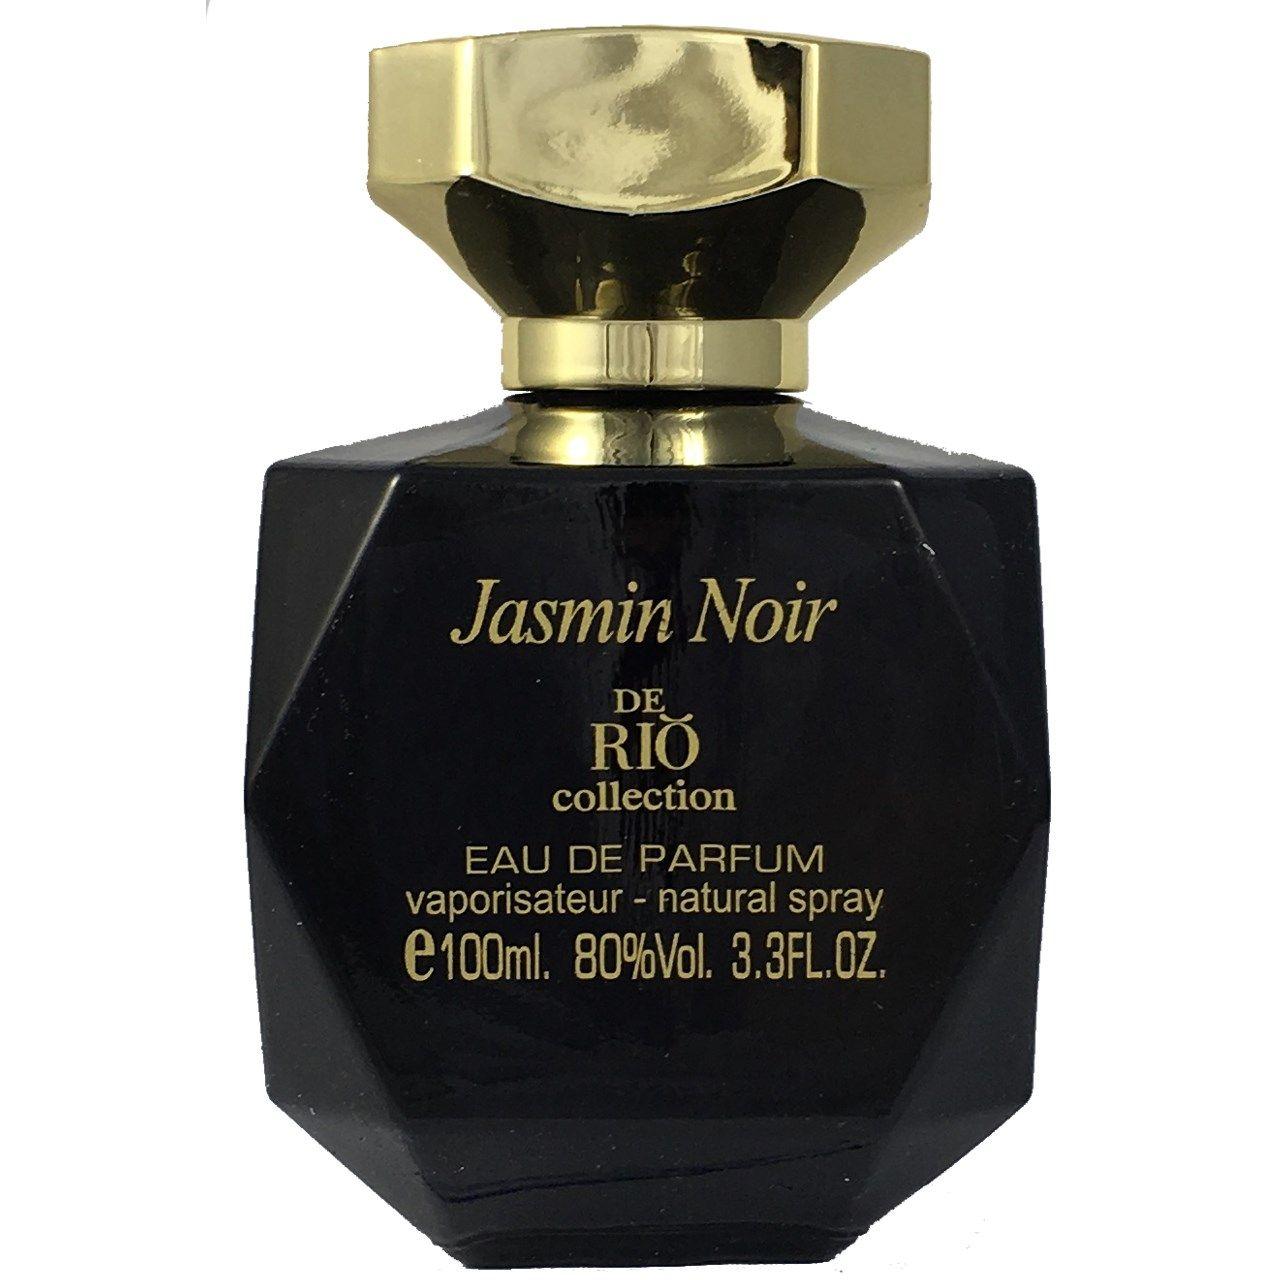 ادو پرفیوم زنانه ریو کالکشن مدل Rio Jasmin Noir حجم 100ml -  - 1